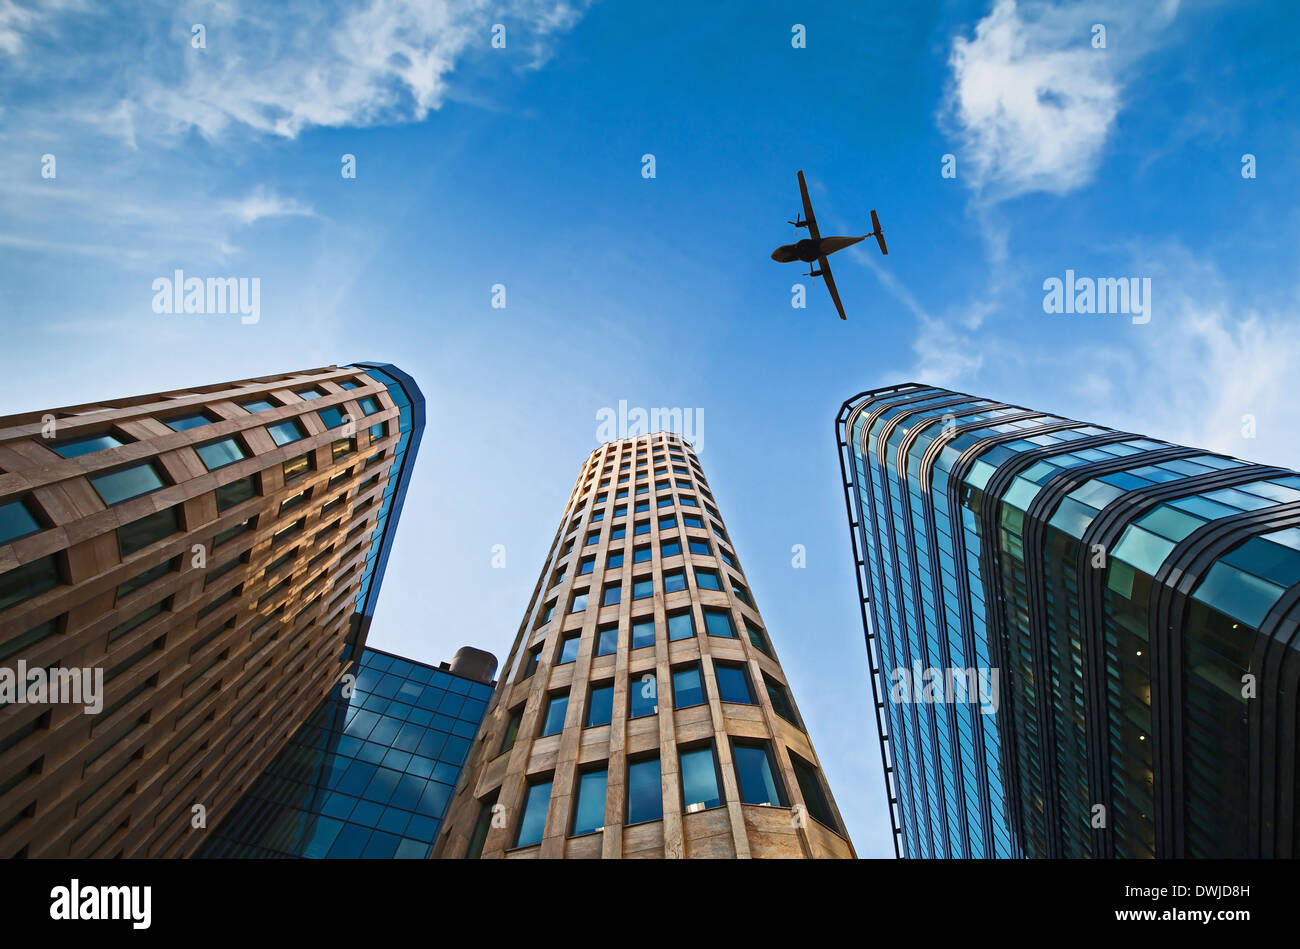 Avión sobre edificios de oficinas Imagen De Stock